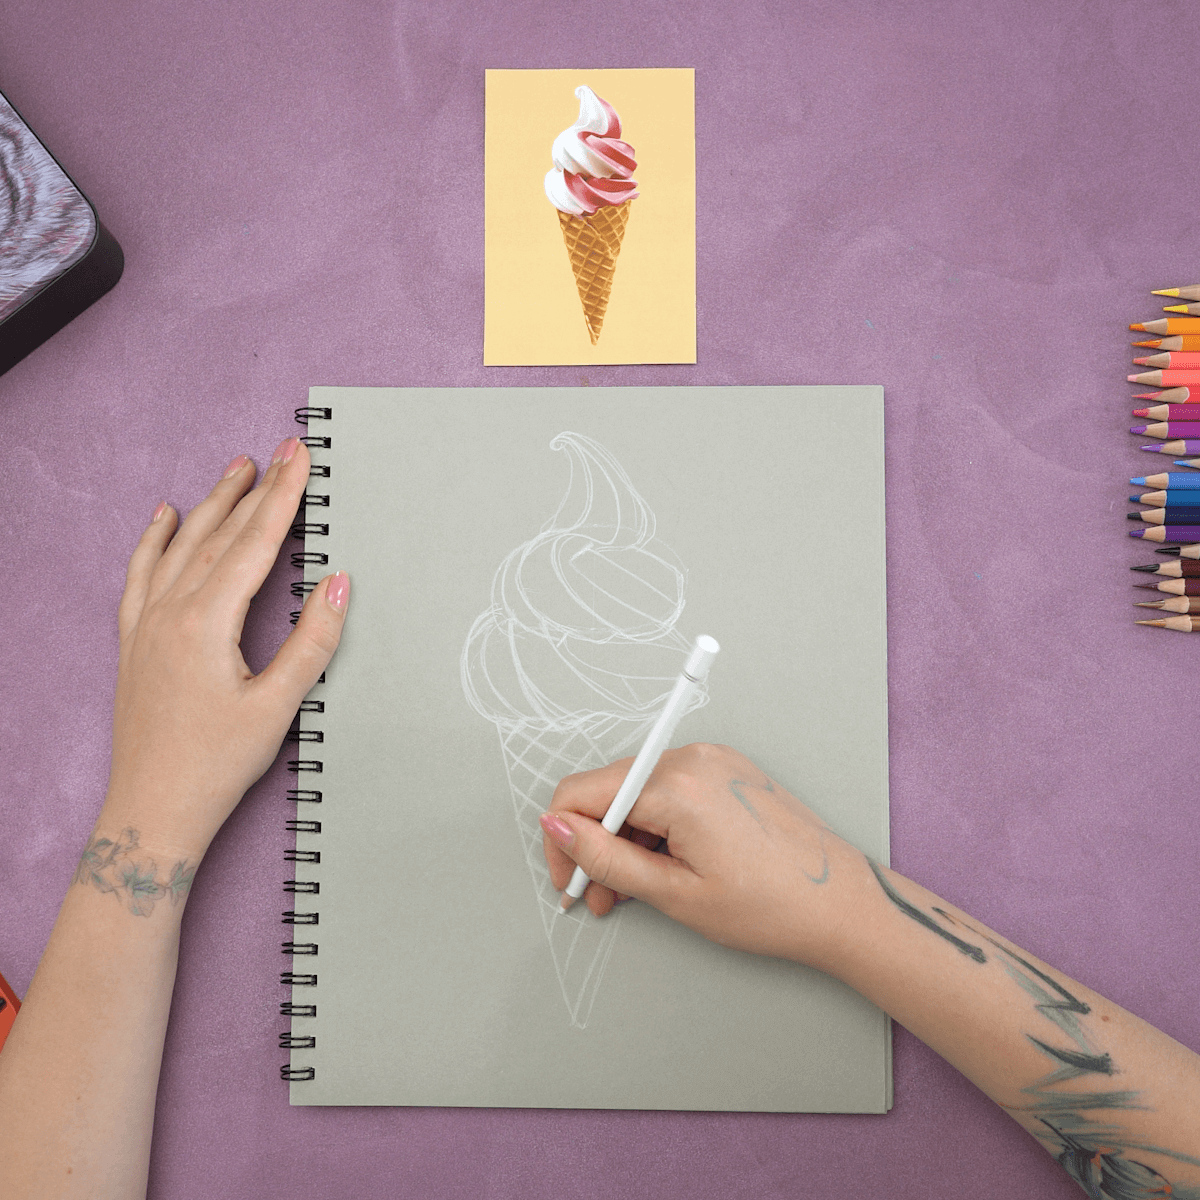 Ice Cream Cone Drawing Step 3